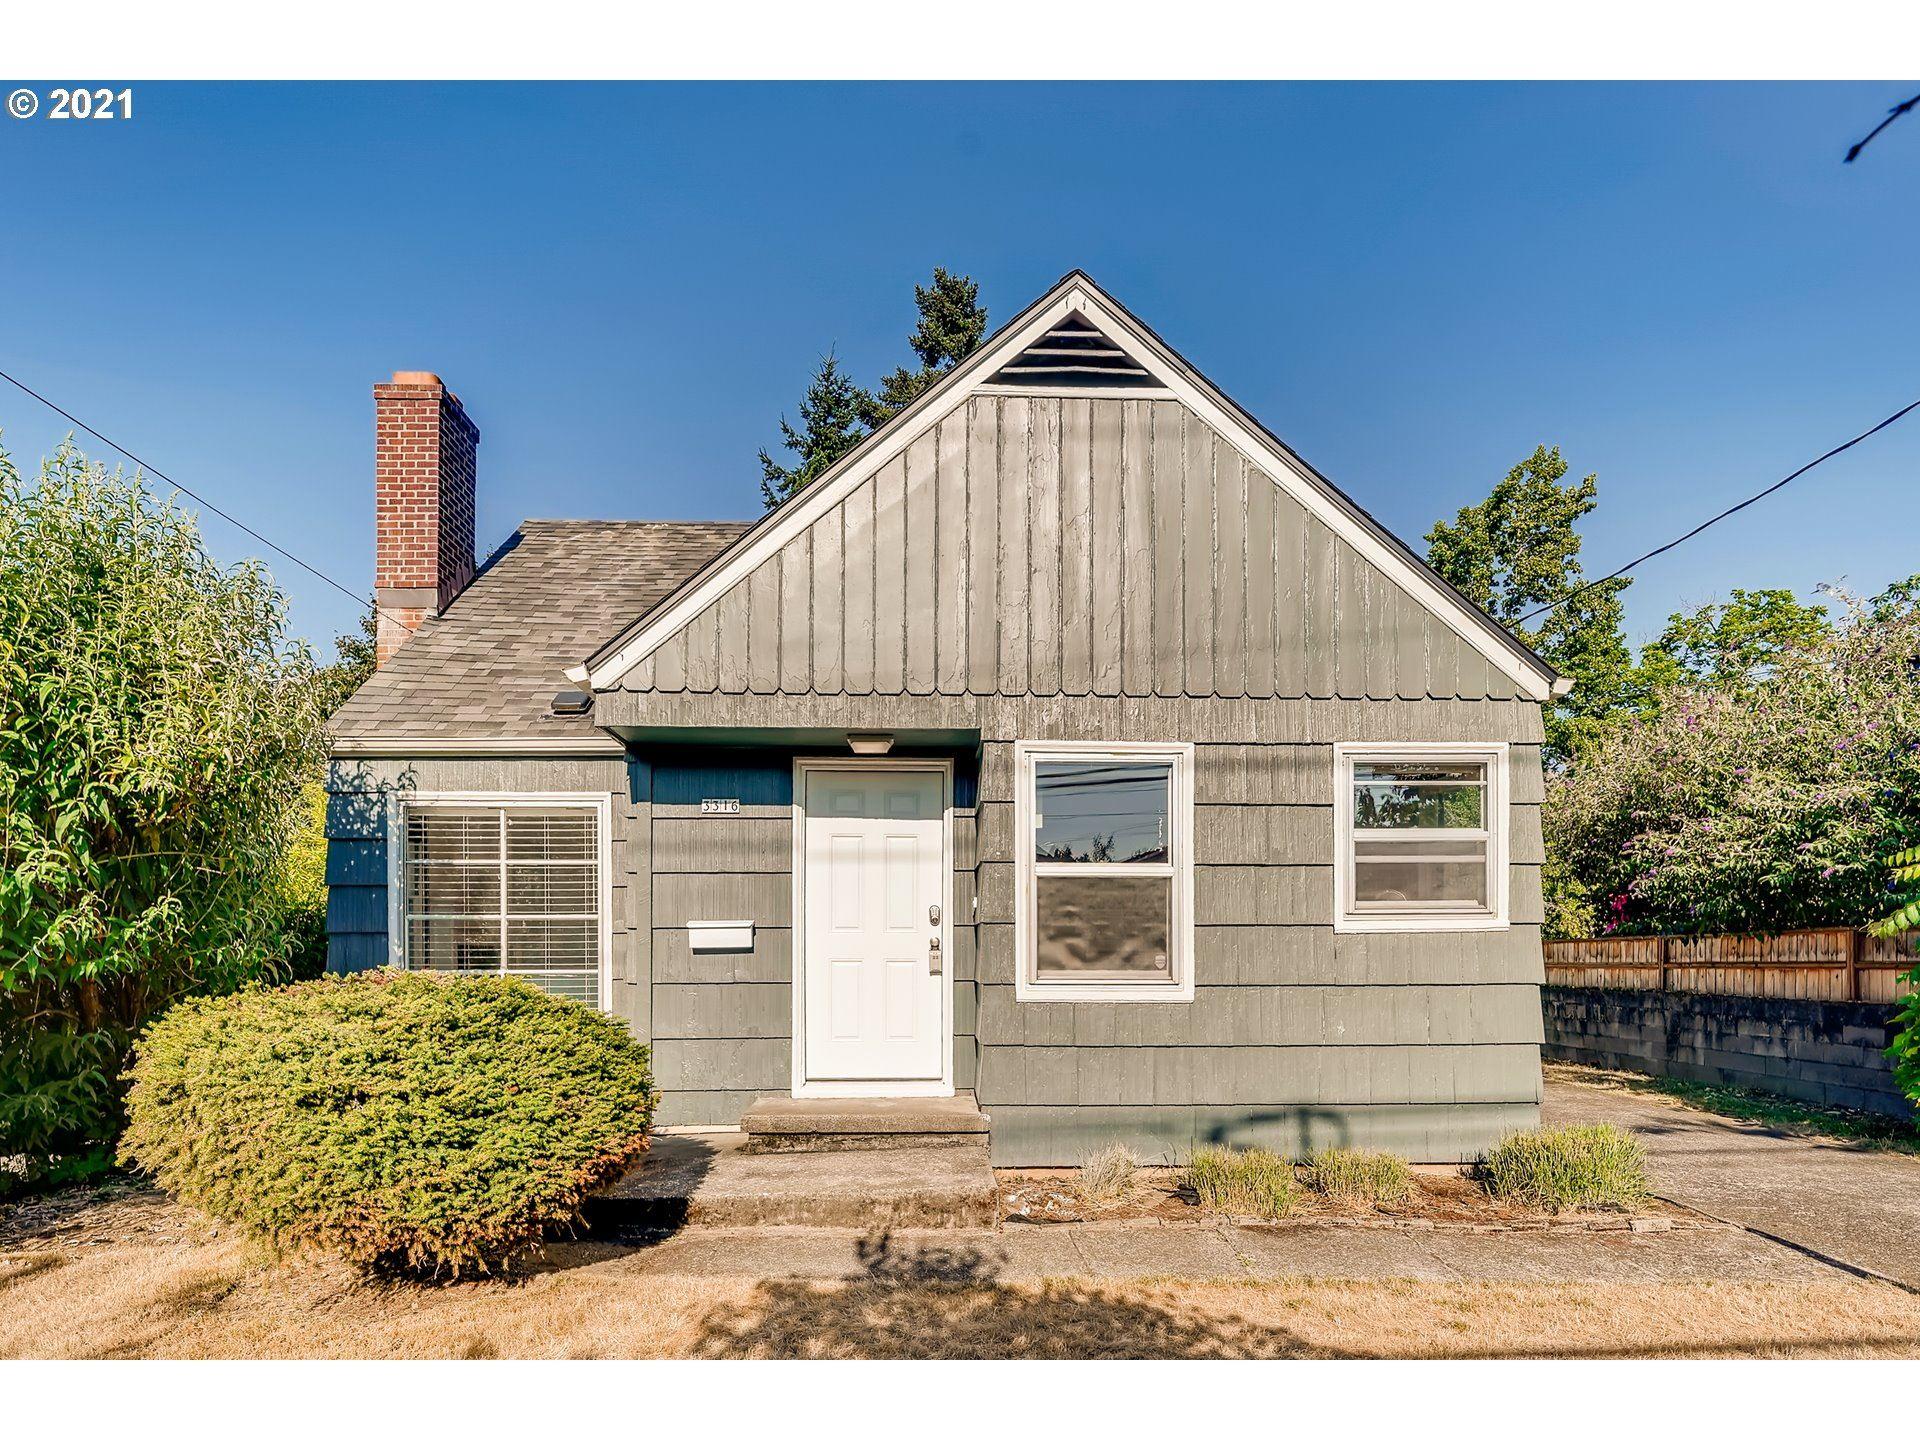 3316 NE 57TH AVE, Portland, OR 97213 - MLS#: 21125312